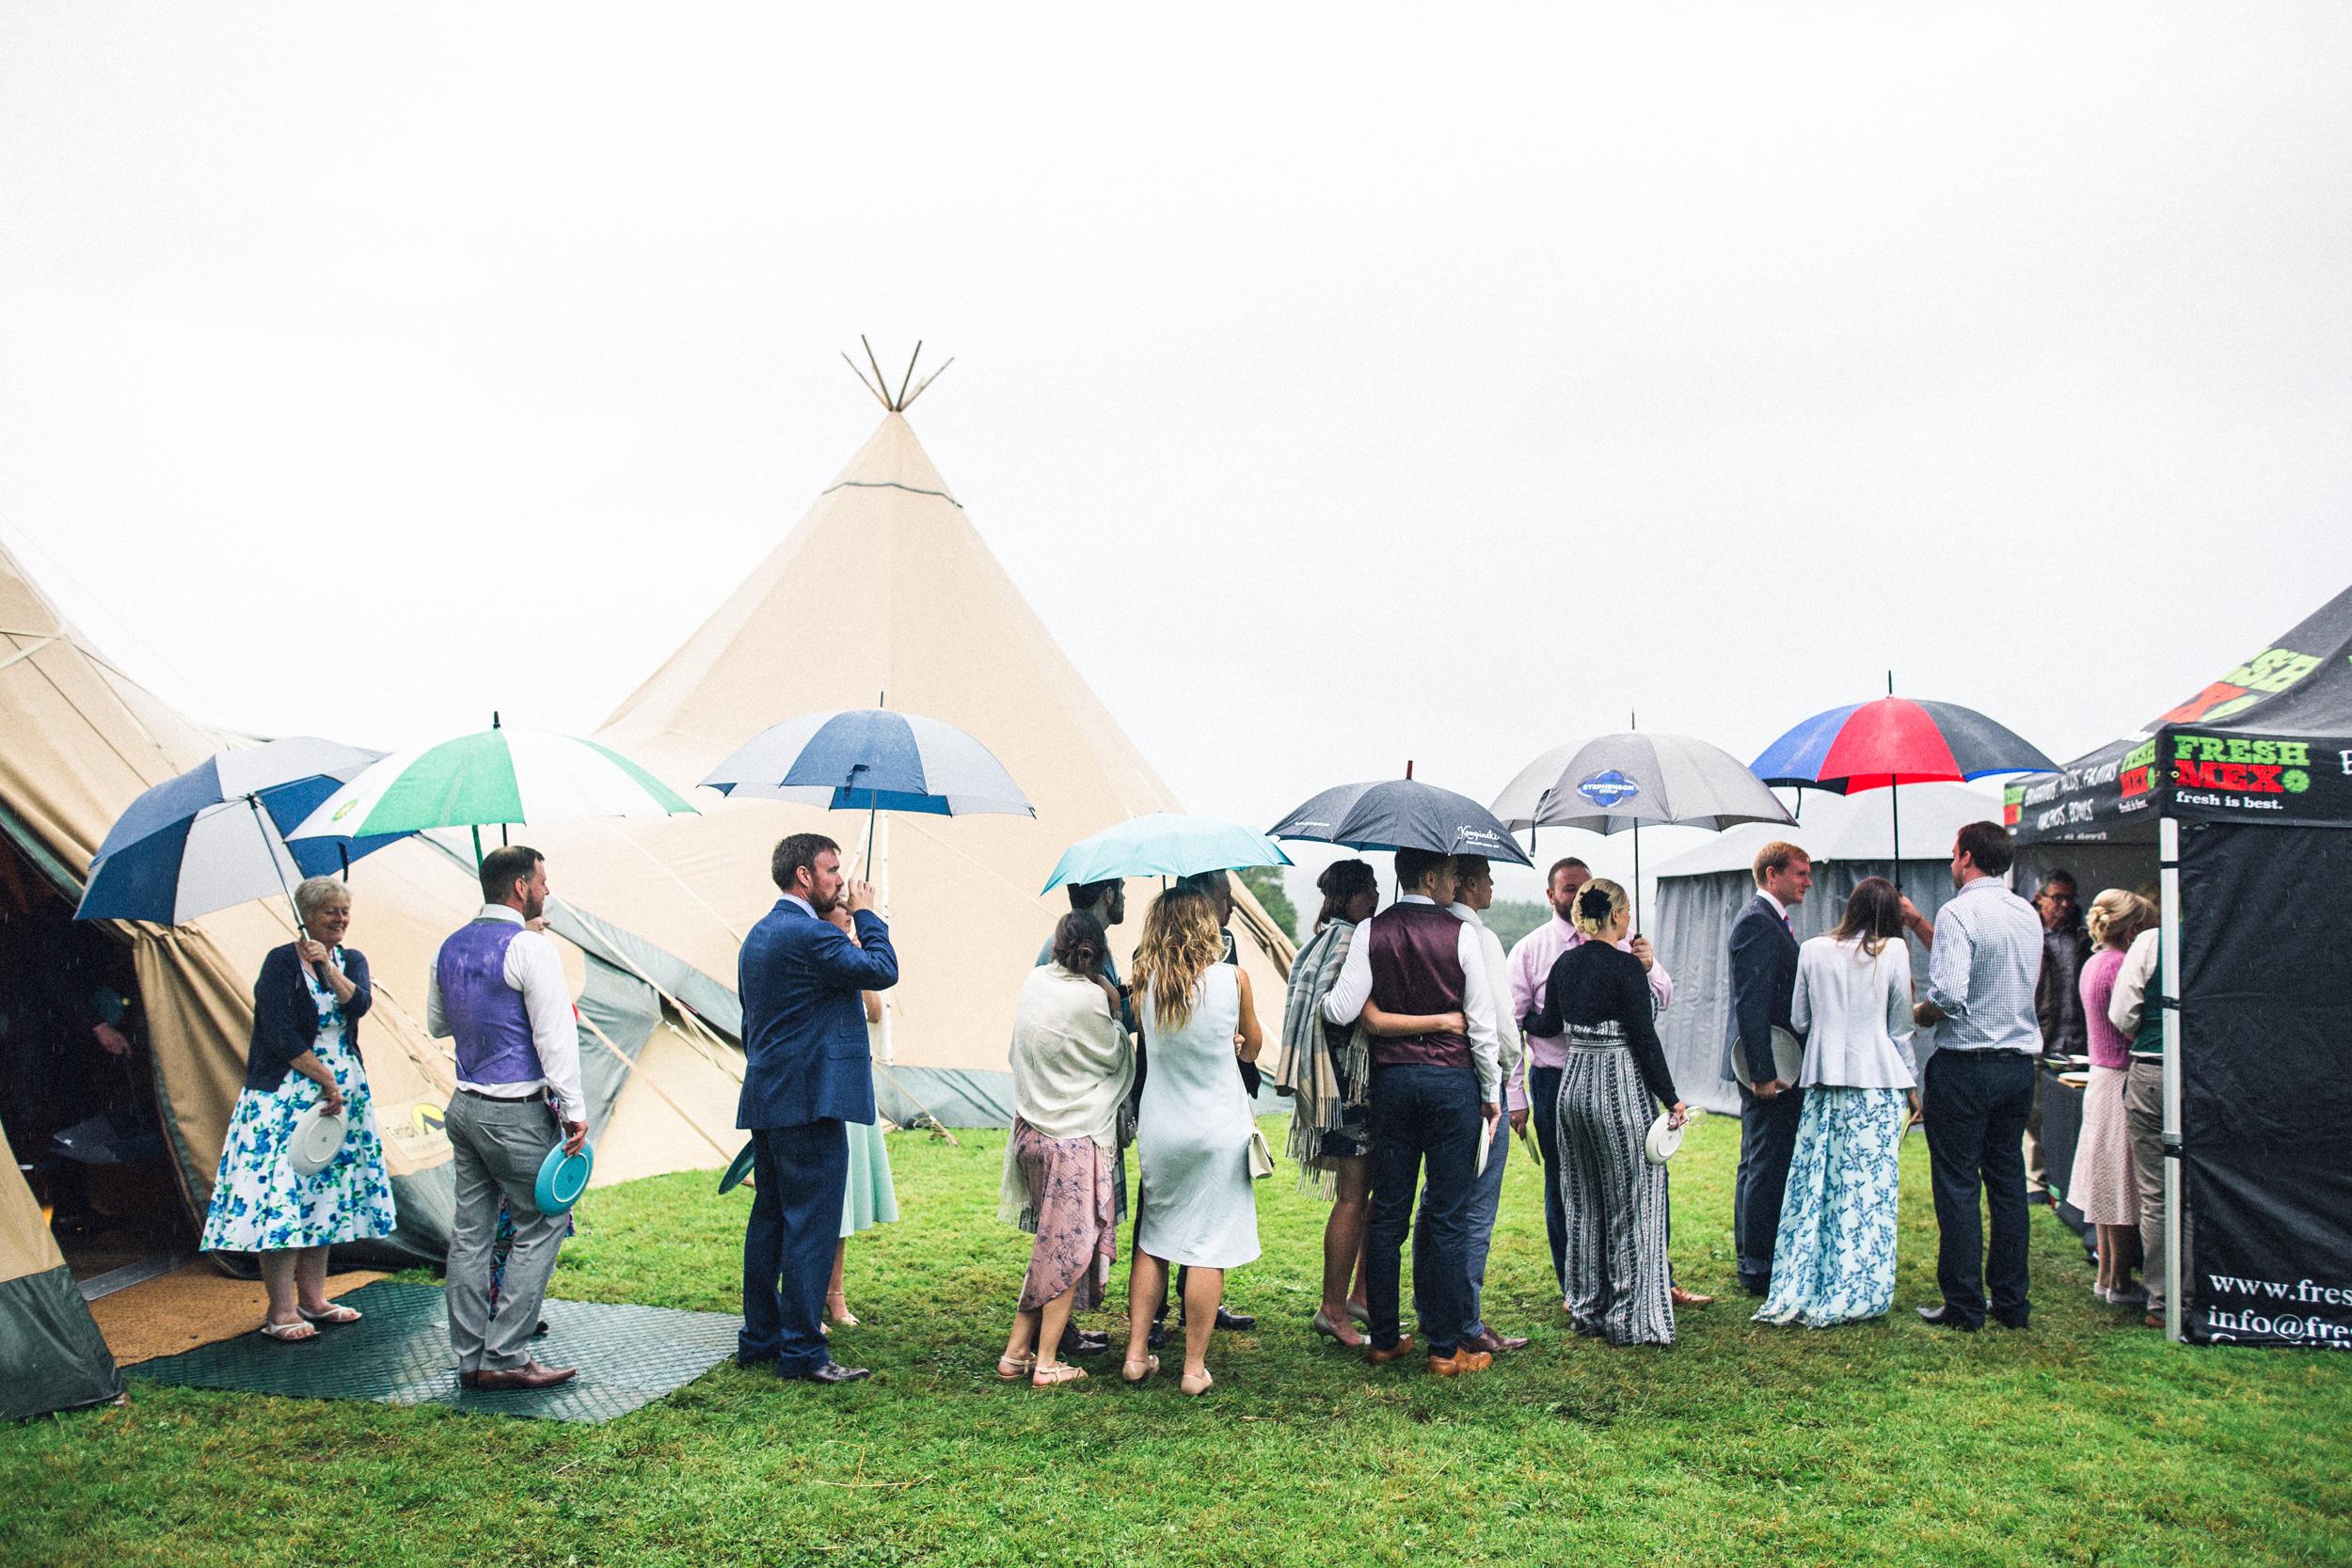 creative-wedding-photography-teesside-north-east-yorkshire-110.jpg